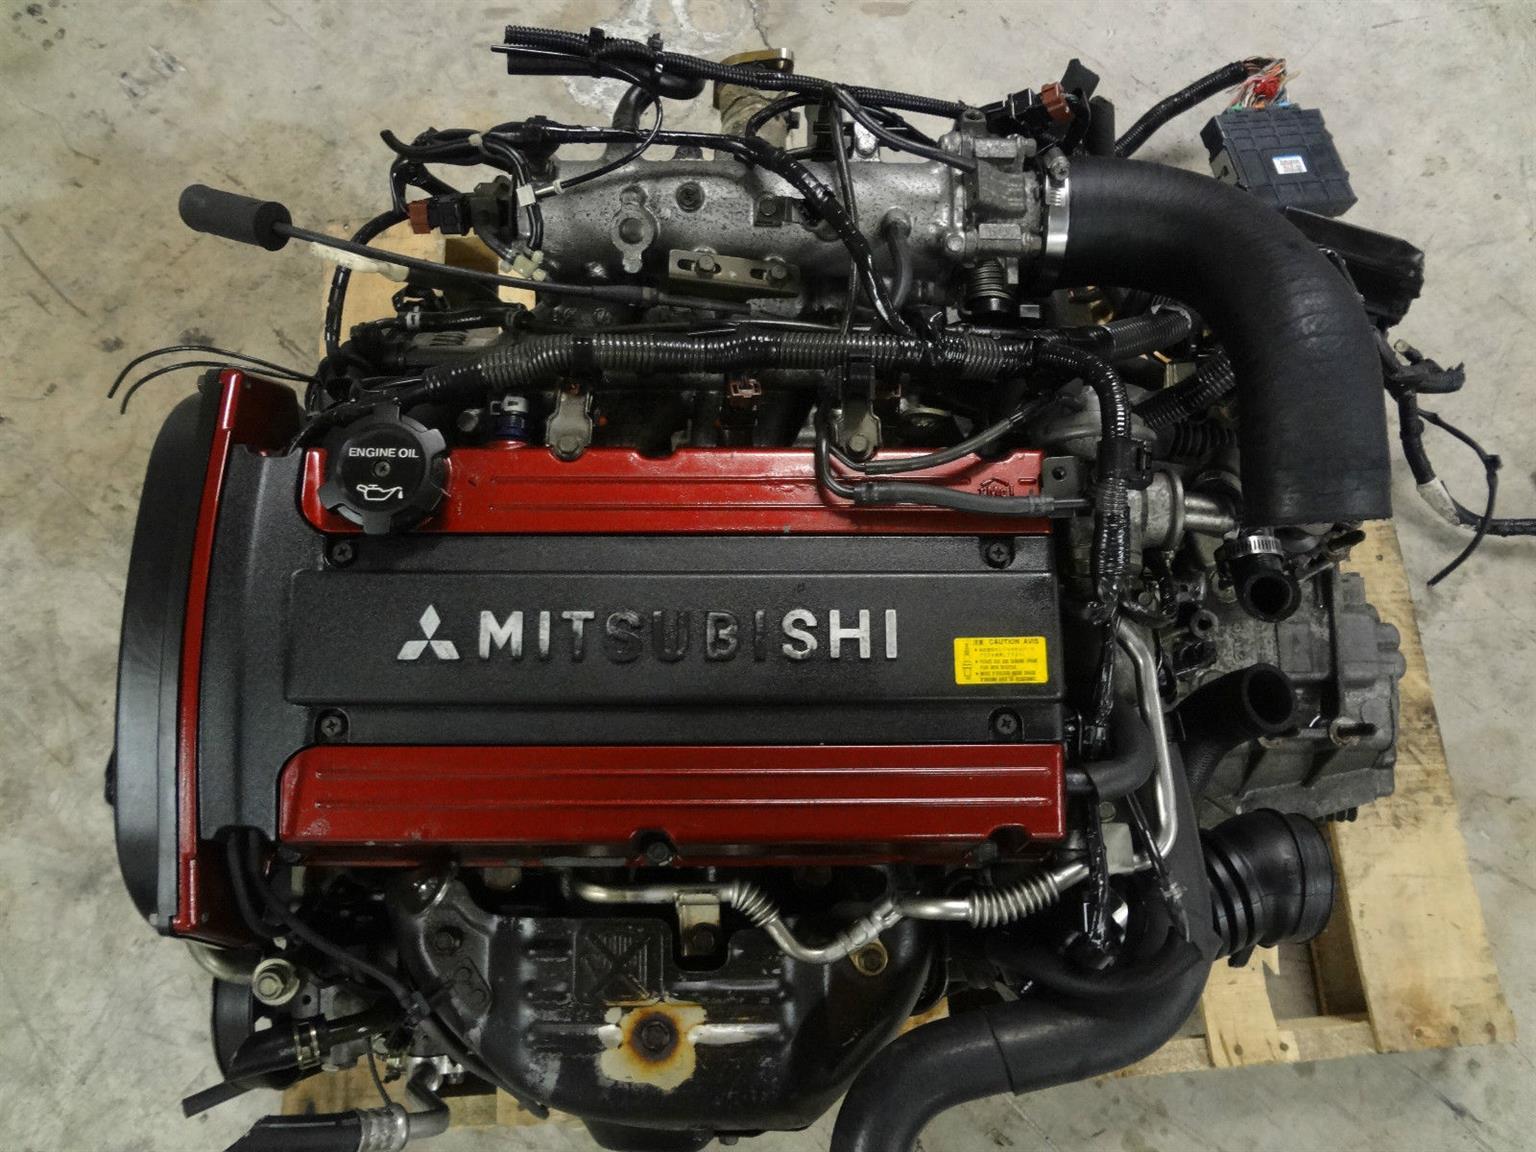 jdm mitsubishi lancer evo 8 engine jdm 4g63 evo viii differential brembo |  junk mail